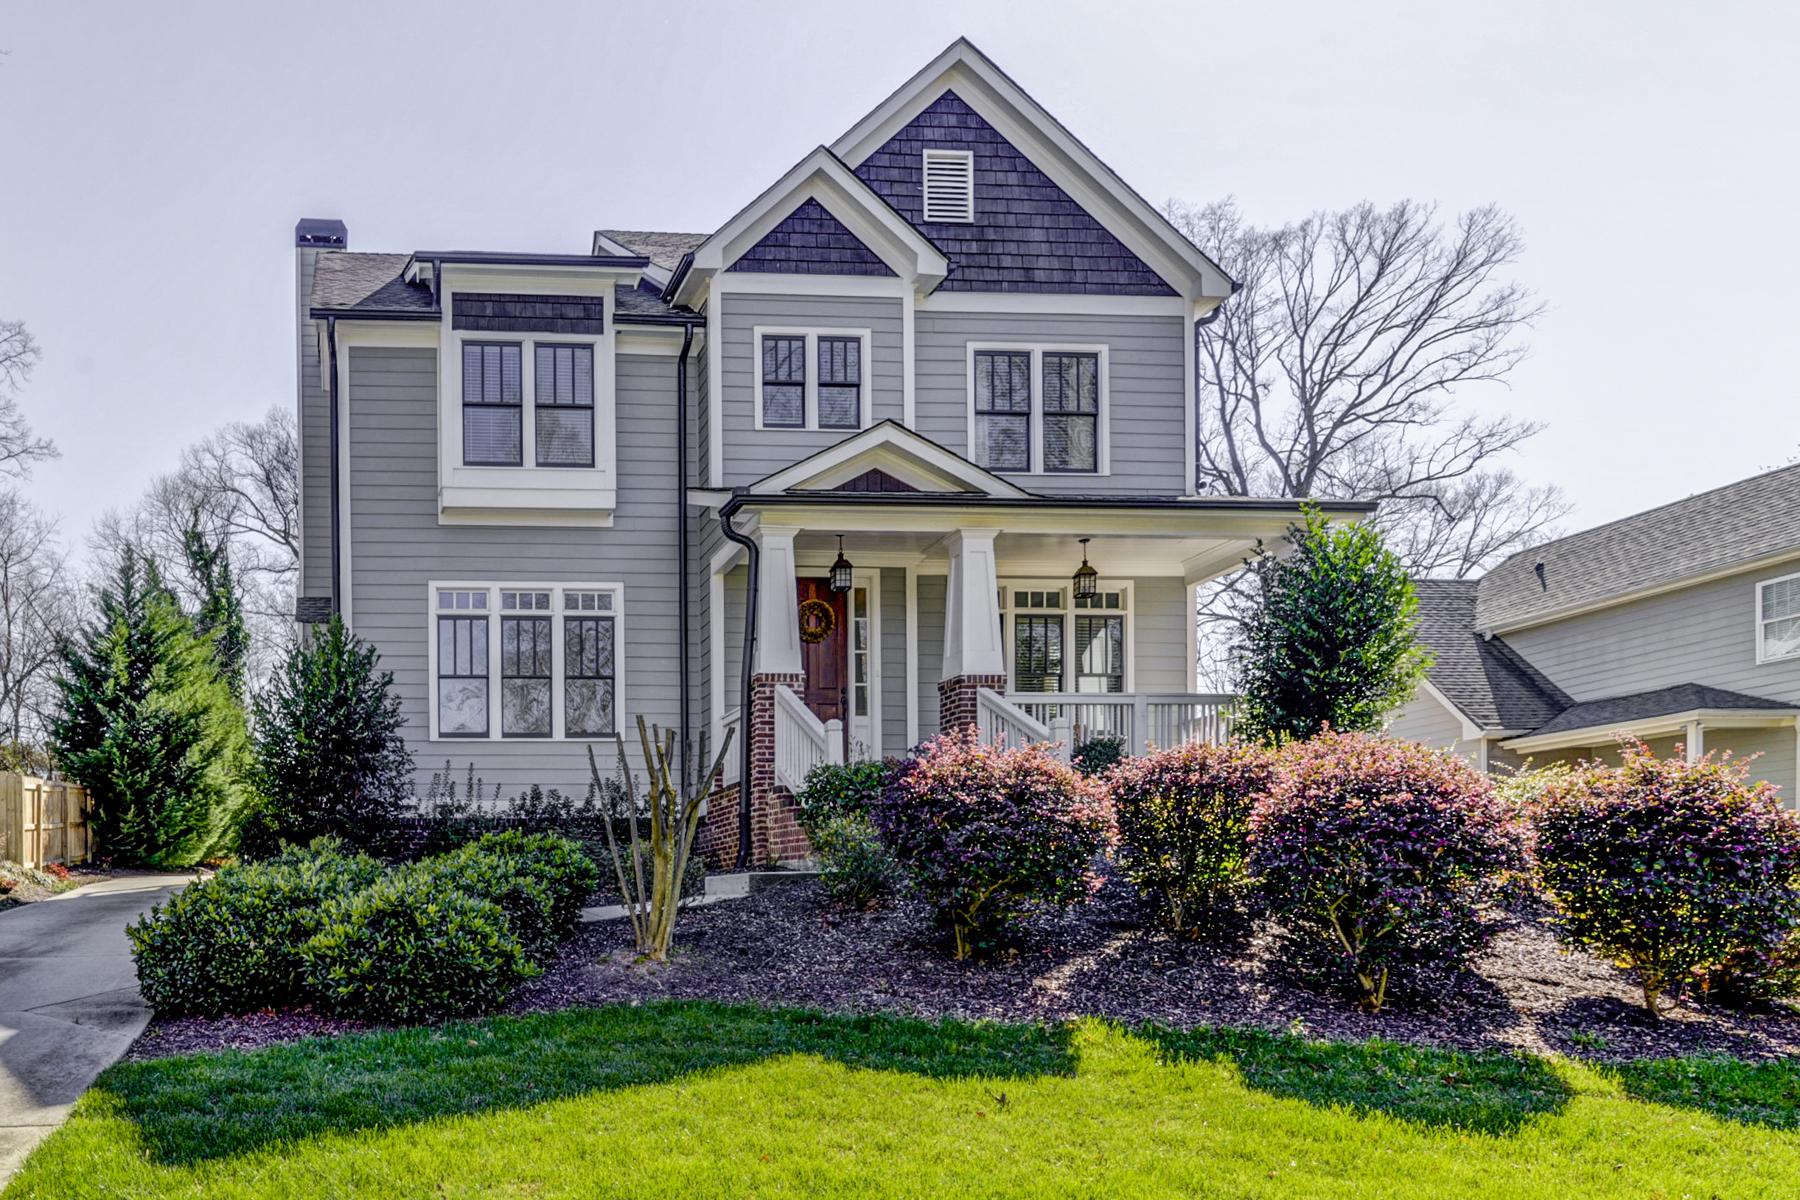 Single Family Home for Sale at Exceptional Craftsman In Ashford Park 1861 8th Street Ashford Park, Atlanta, Georgia, 30341 United States